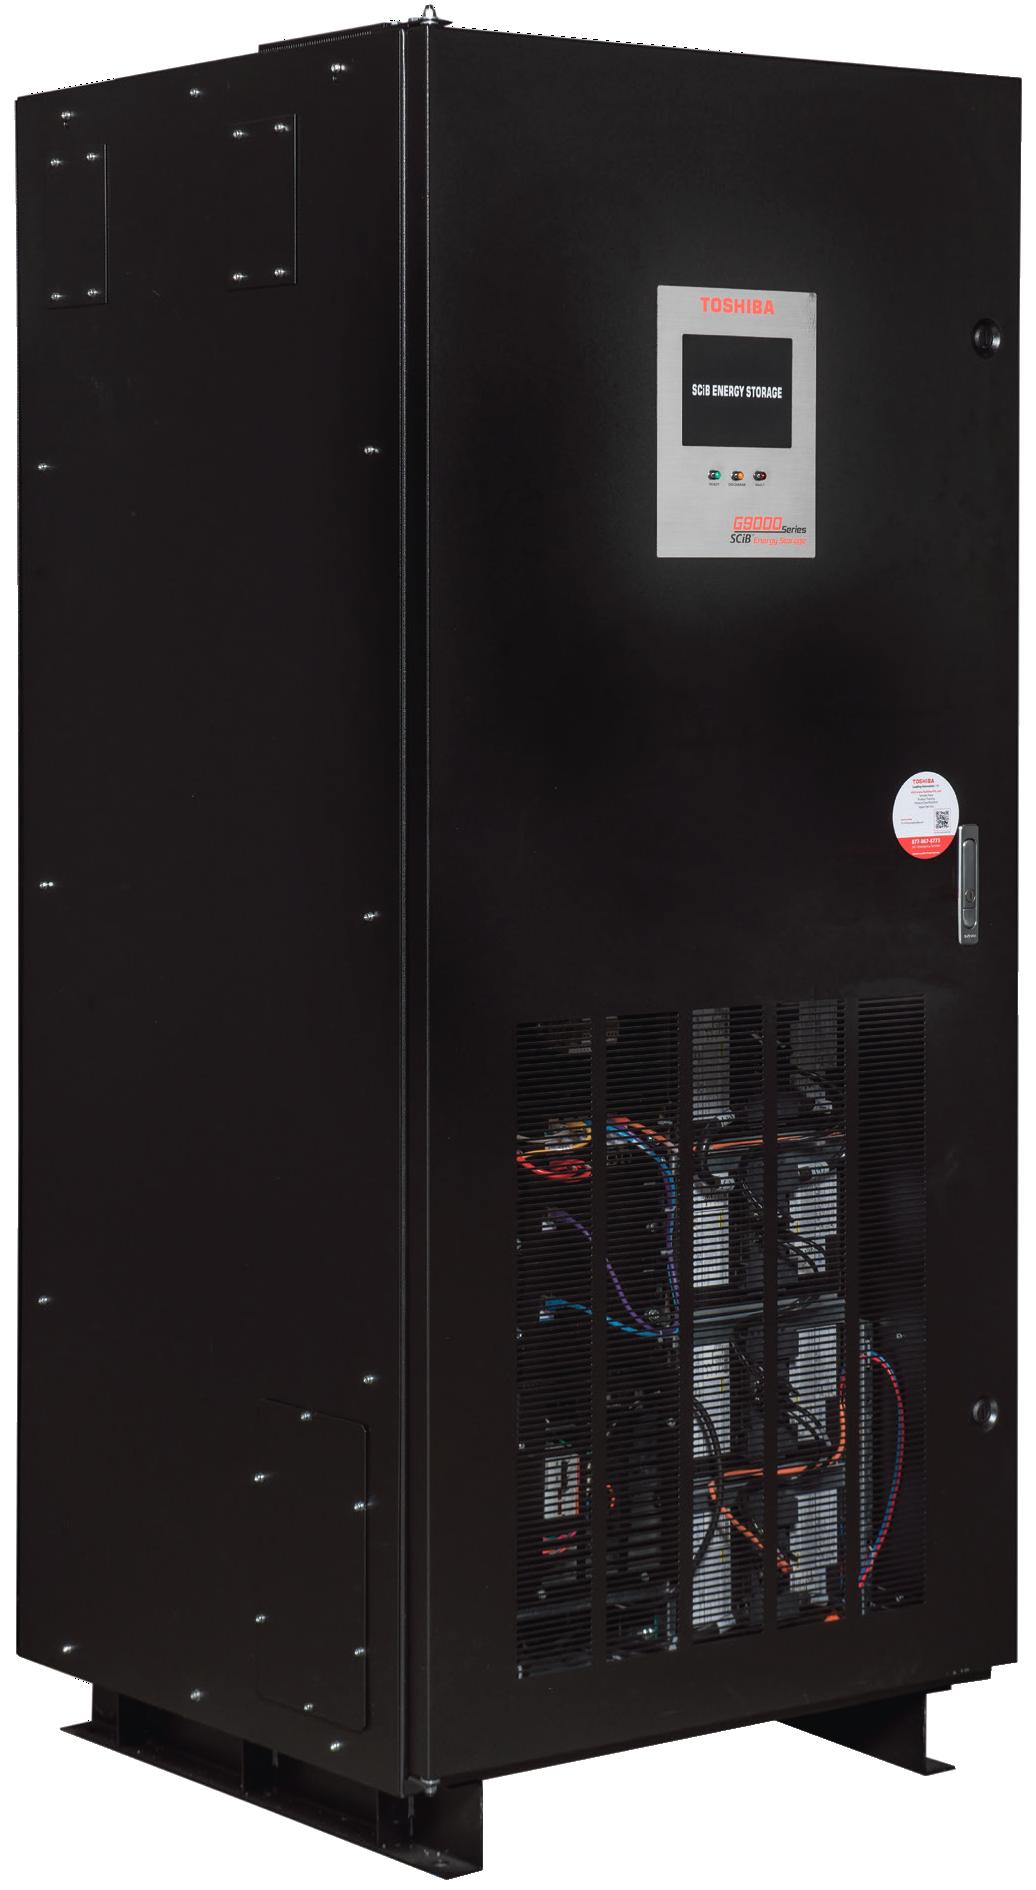 Uninterruptible Power Systems Electronics Toshiba Connector Wiring Diagram Scib Ess